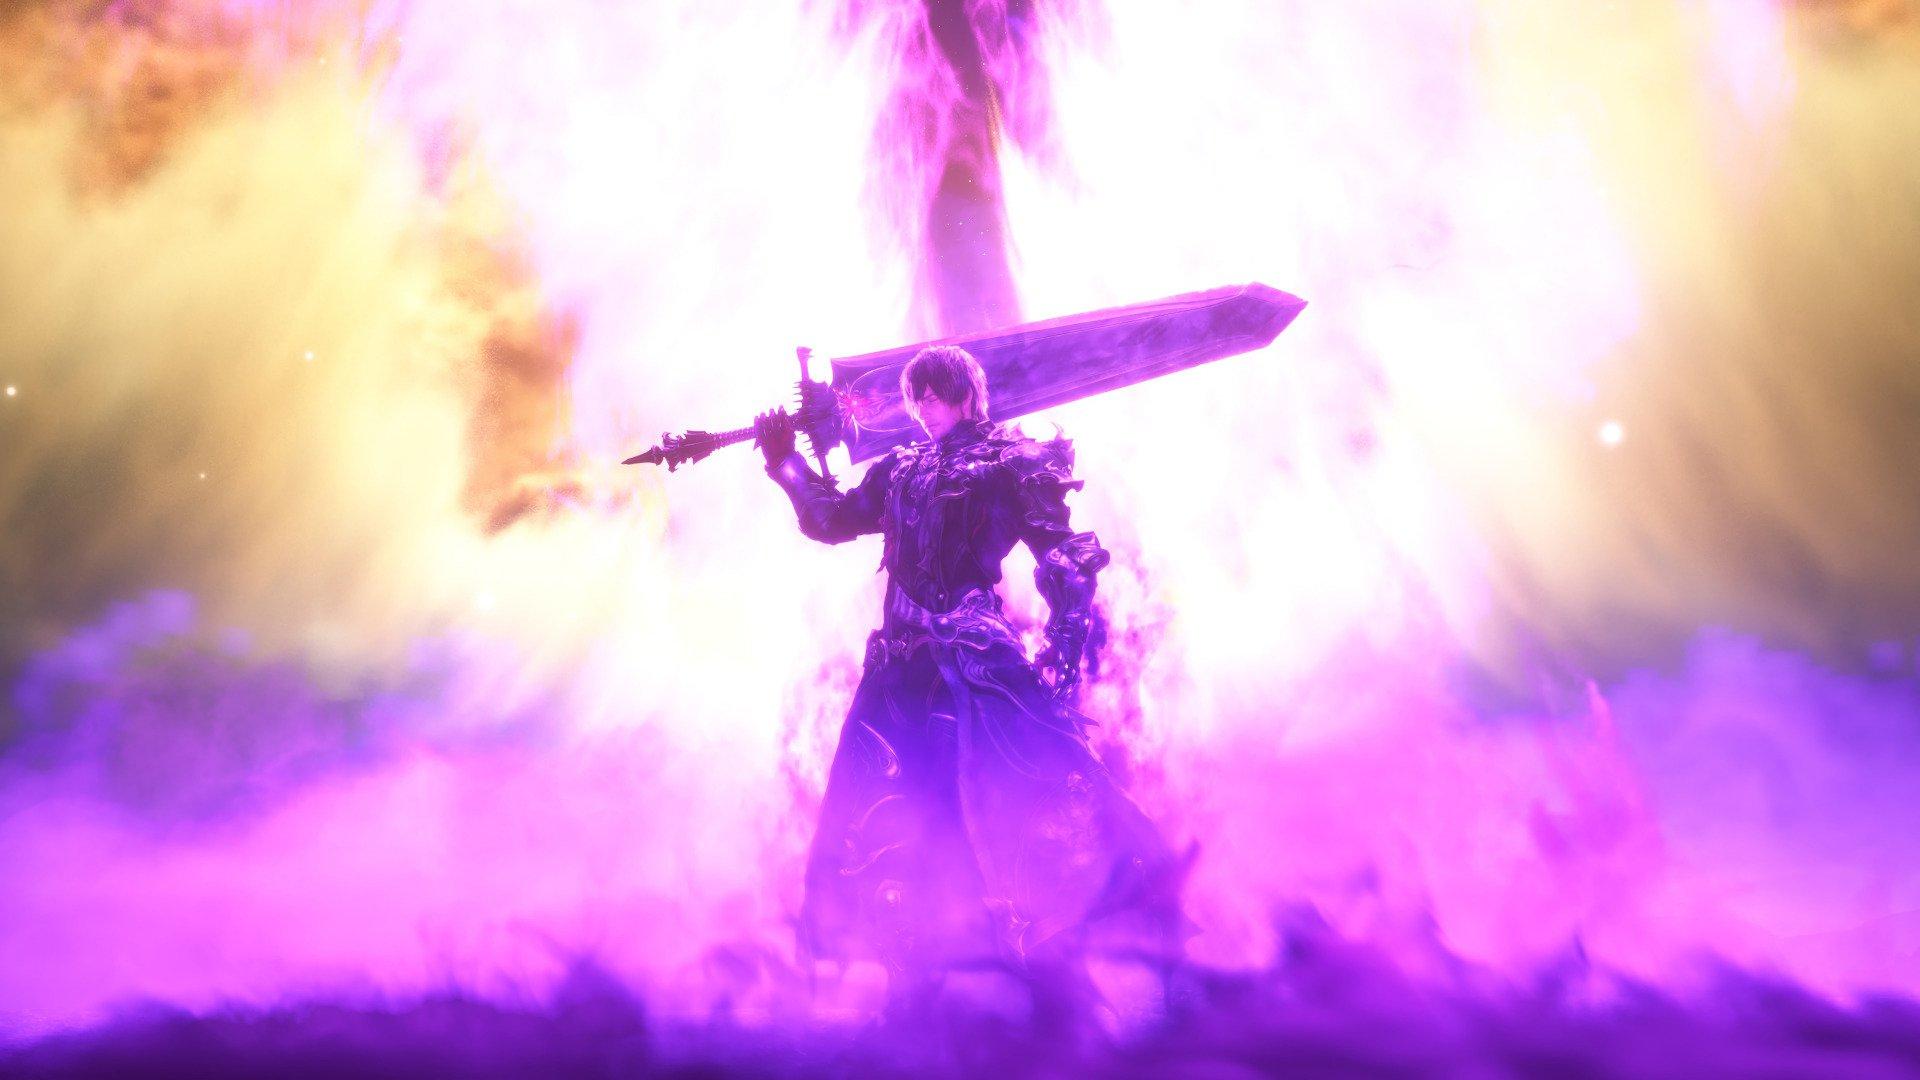 10 Final Fantasy Xiv Shadowbringers Hd Wallpapers Background